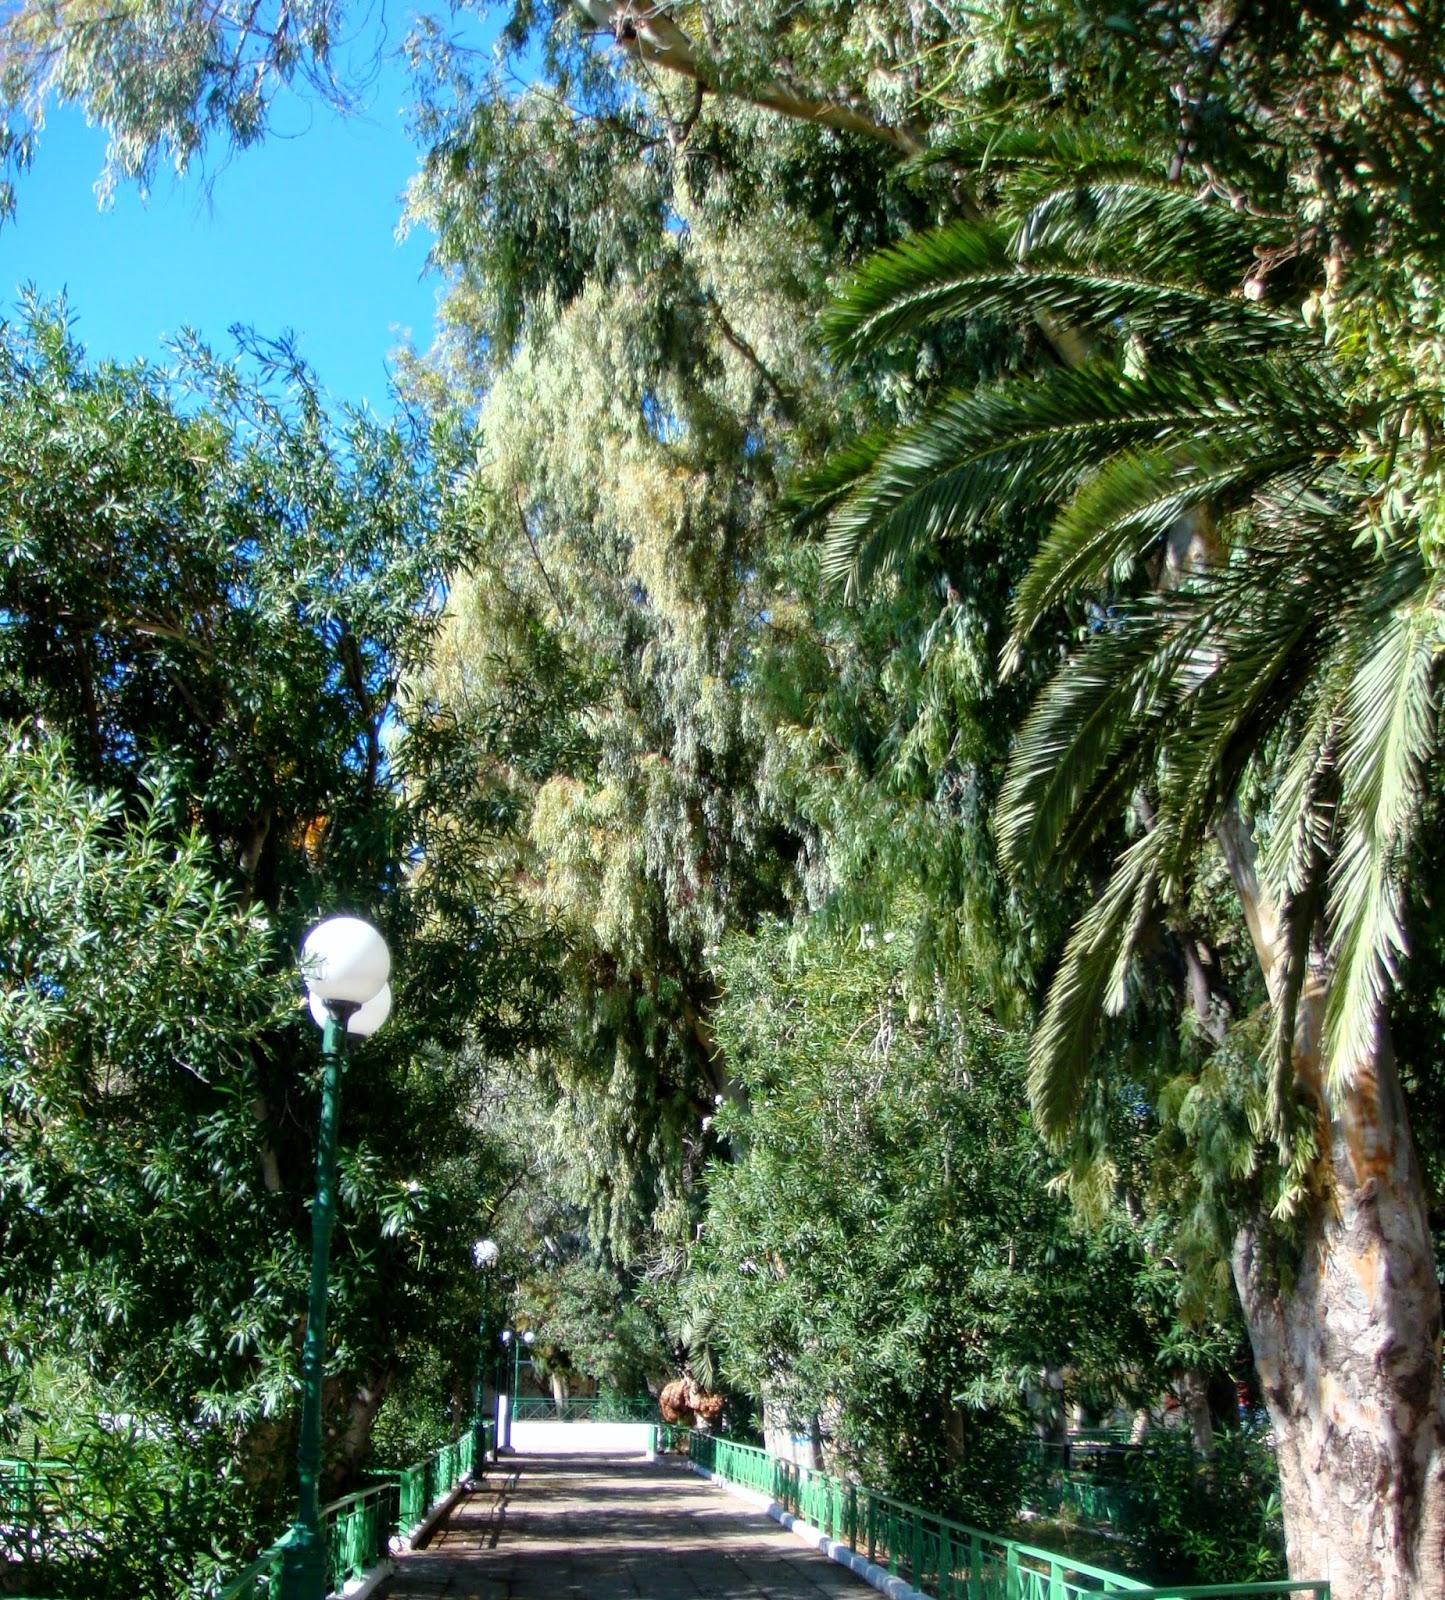 A shady walkway in Loutraki Park